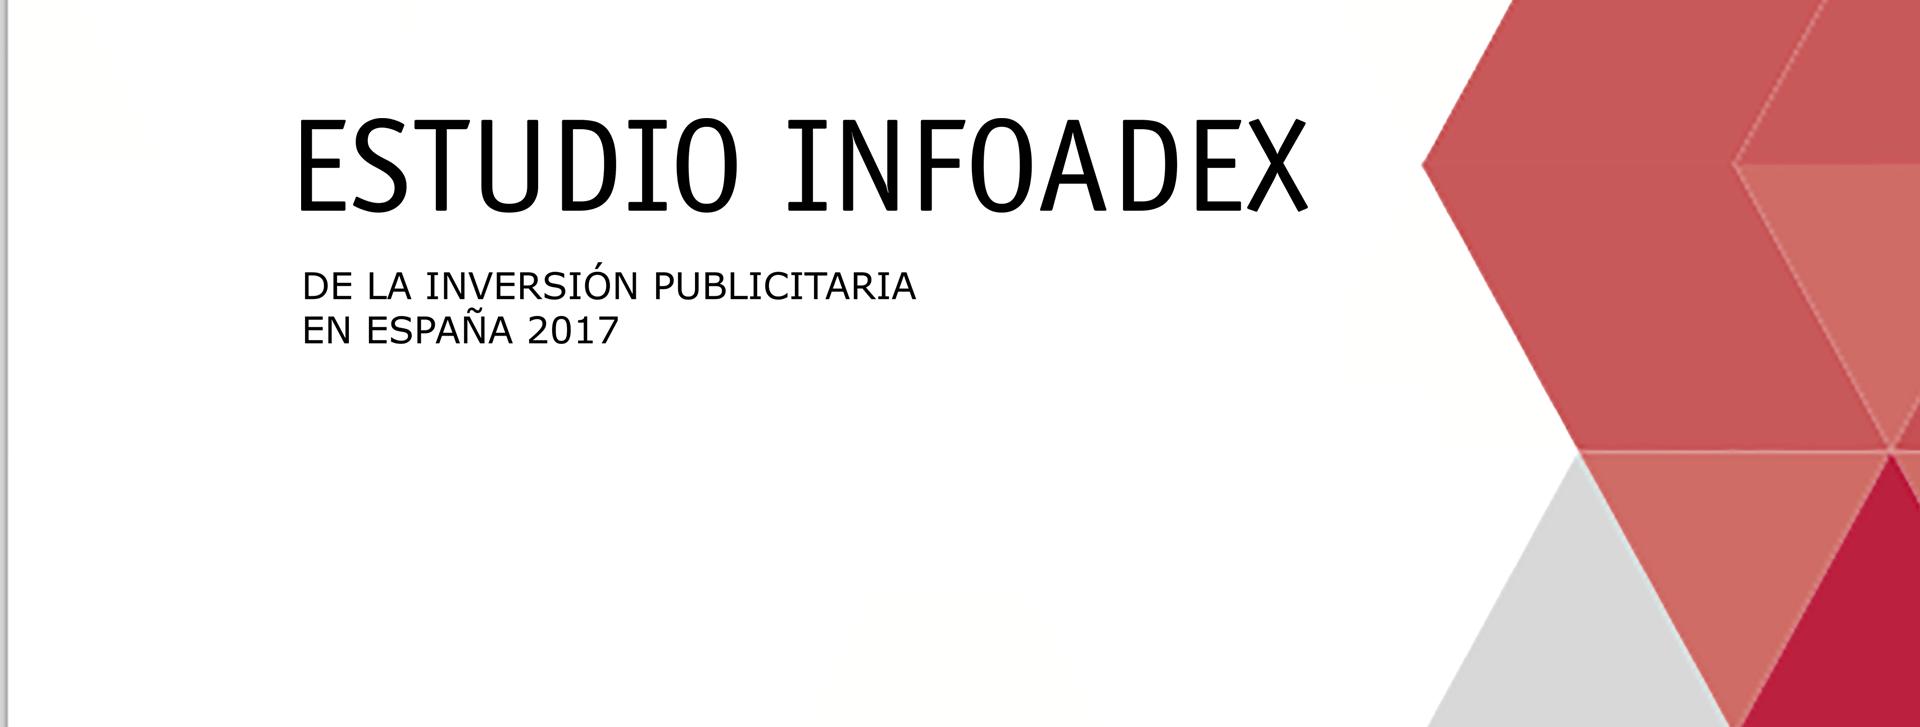 3071182-1487634908